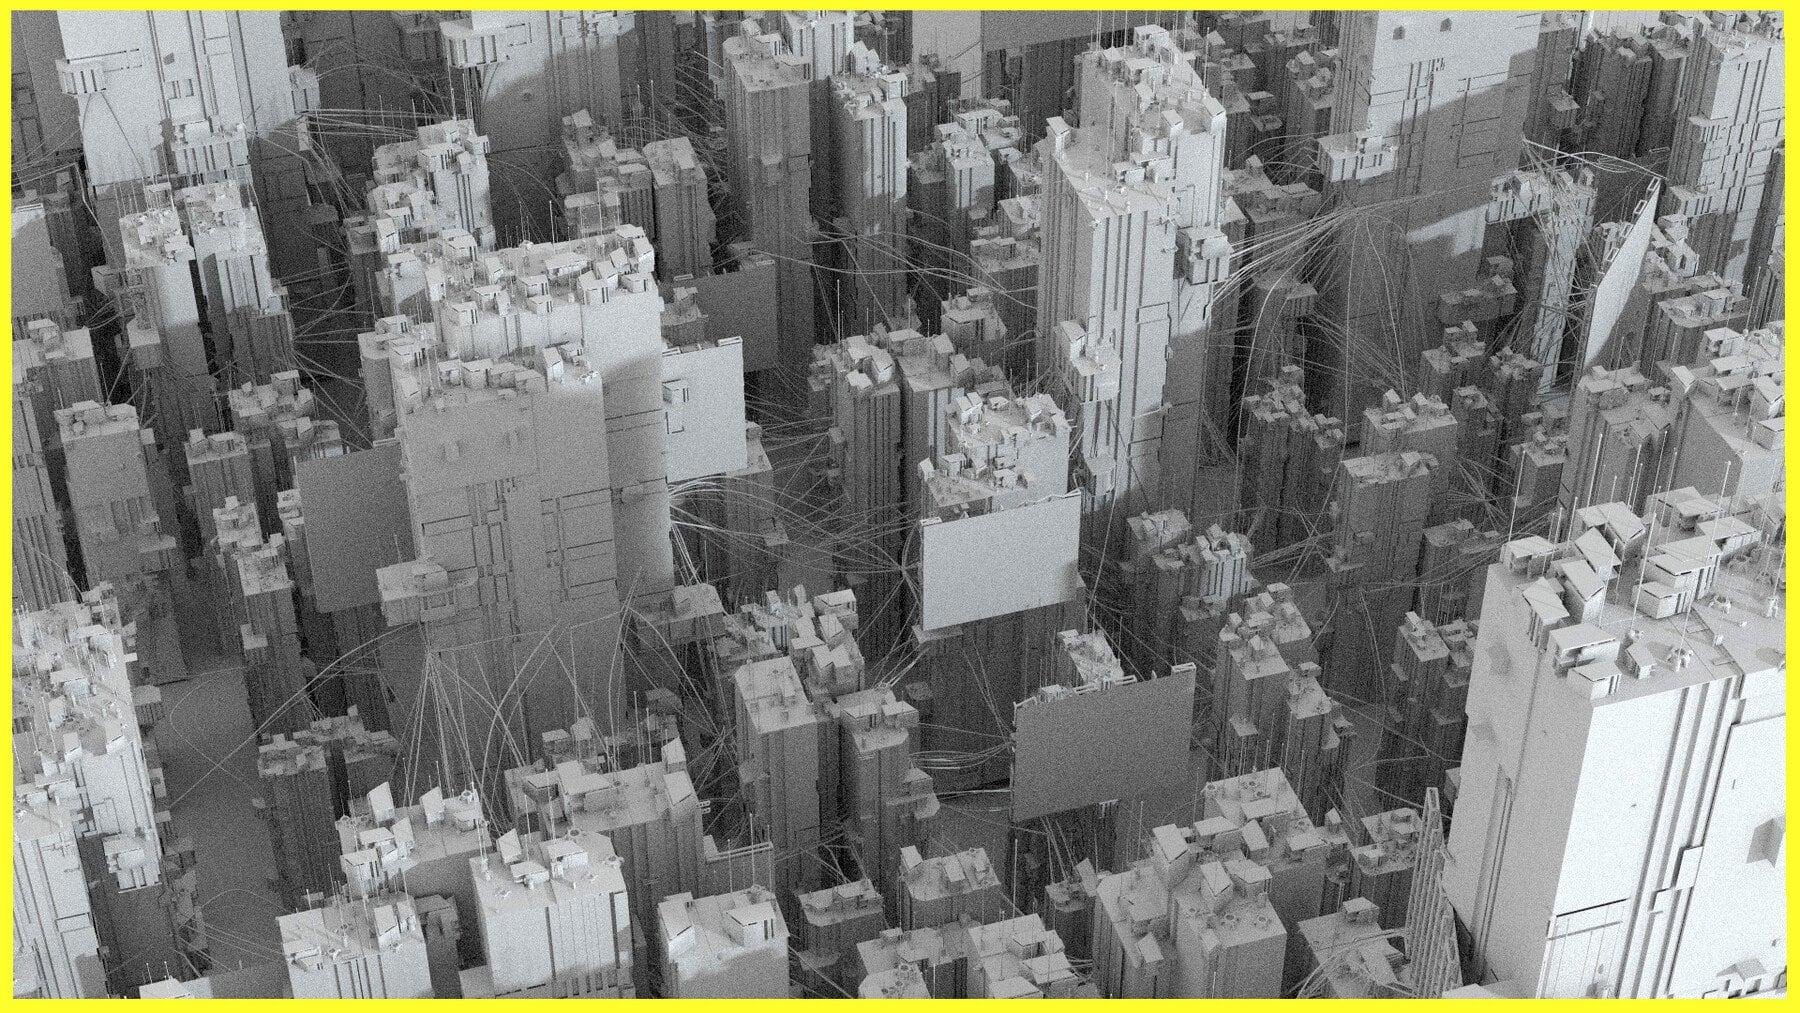 kitbash cyberpunk 3d building elements